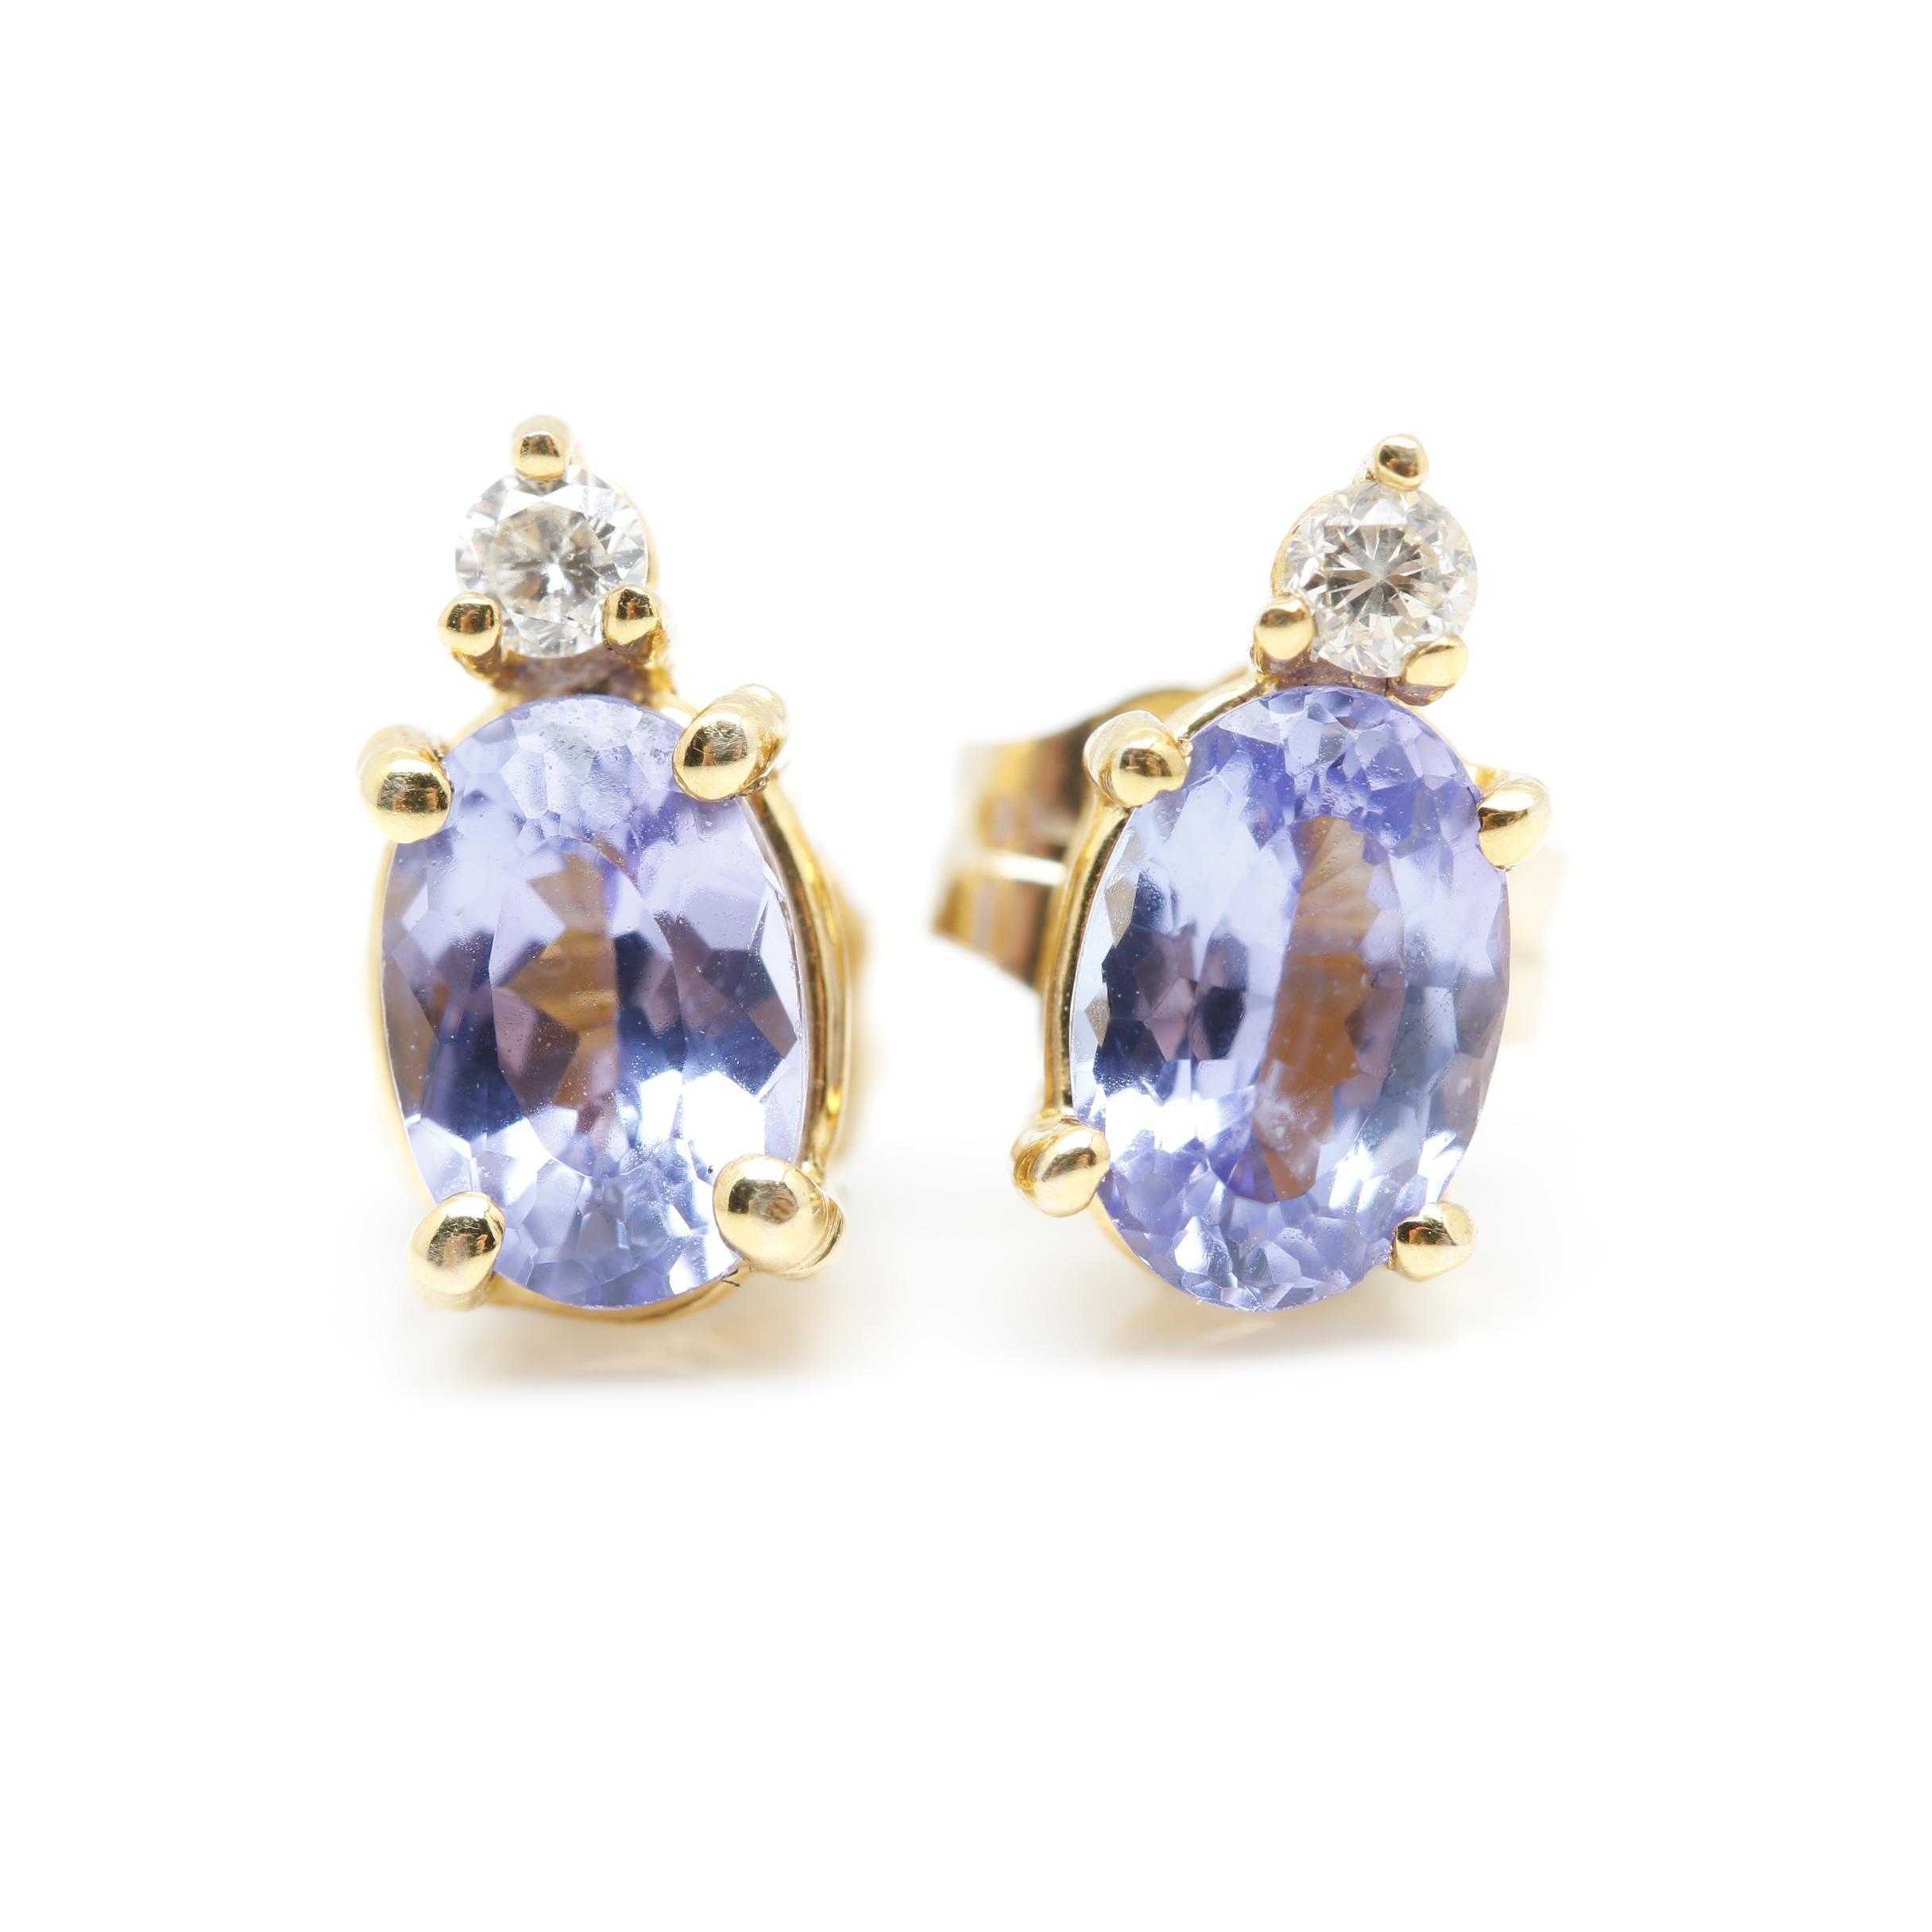 14K Yellow Gold Tanzanite and Diamond Earrings